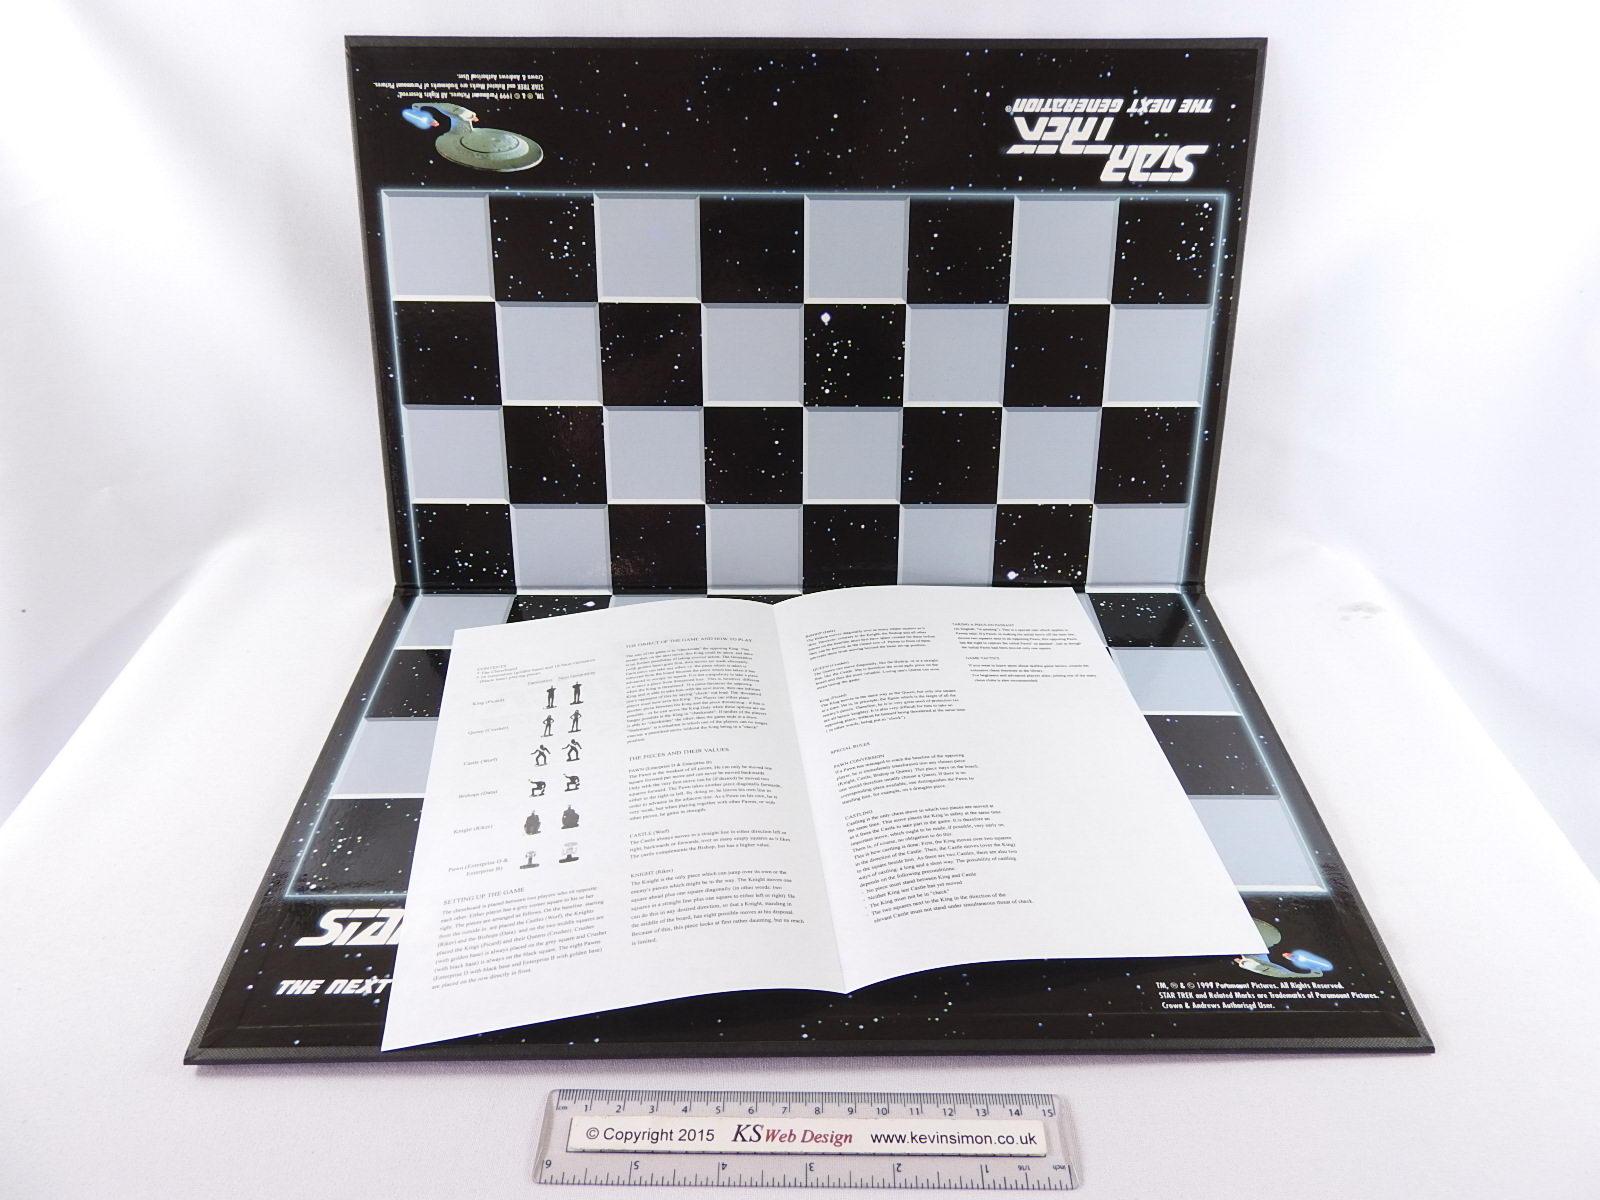 Star Trek The Next Generation Tng 3d Chess Set 1999 Ebay